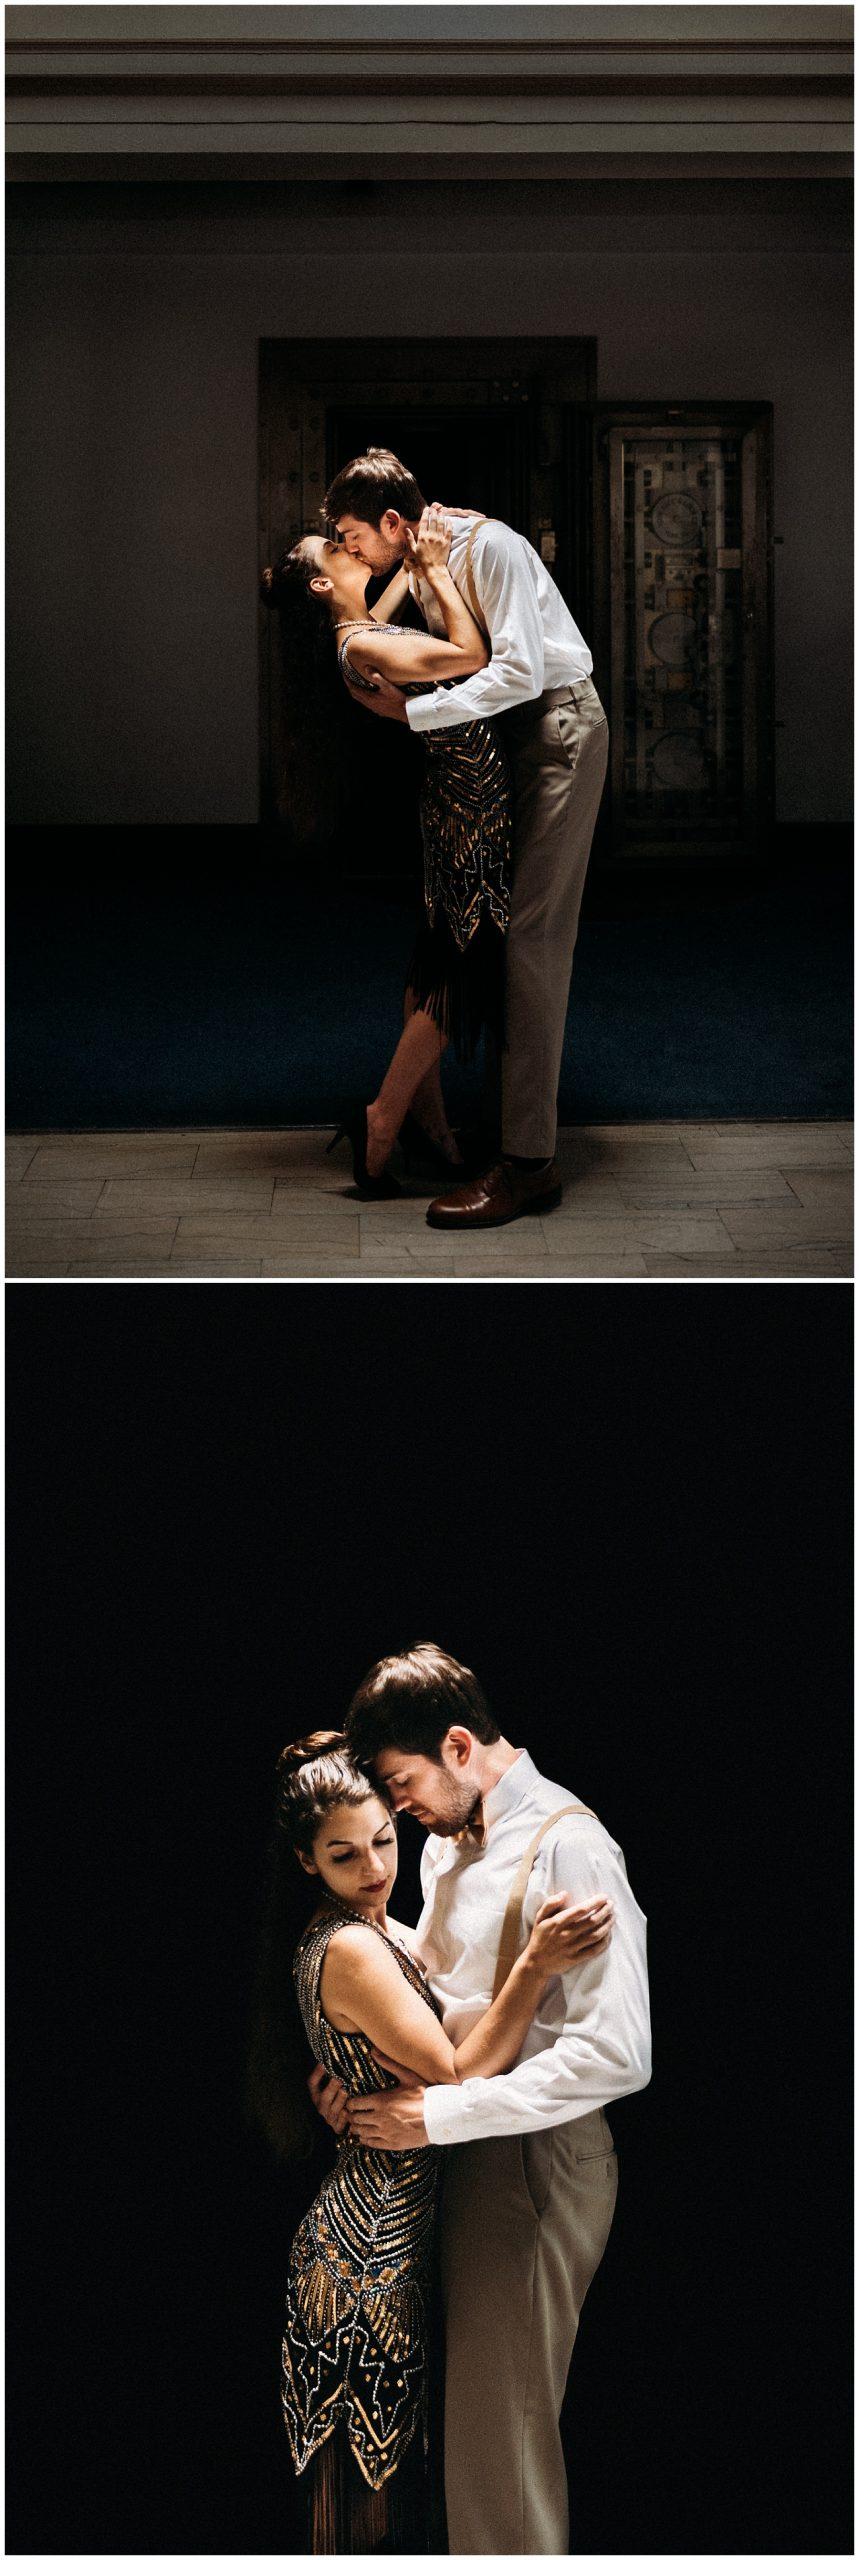 gatsby-styled-couples-shoot-final-g-web-20190707-0063_CCS-1.jpg